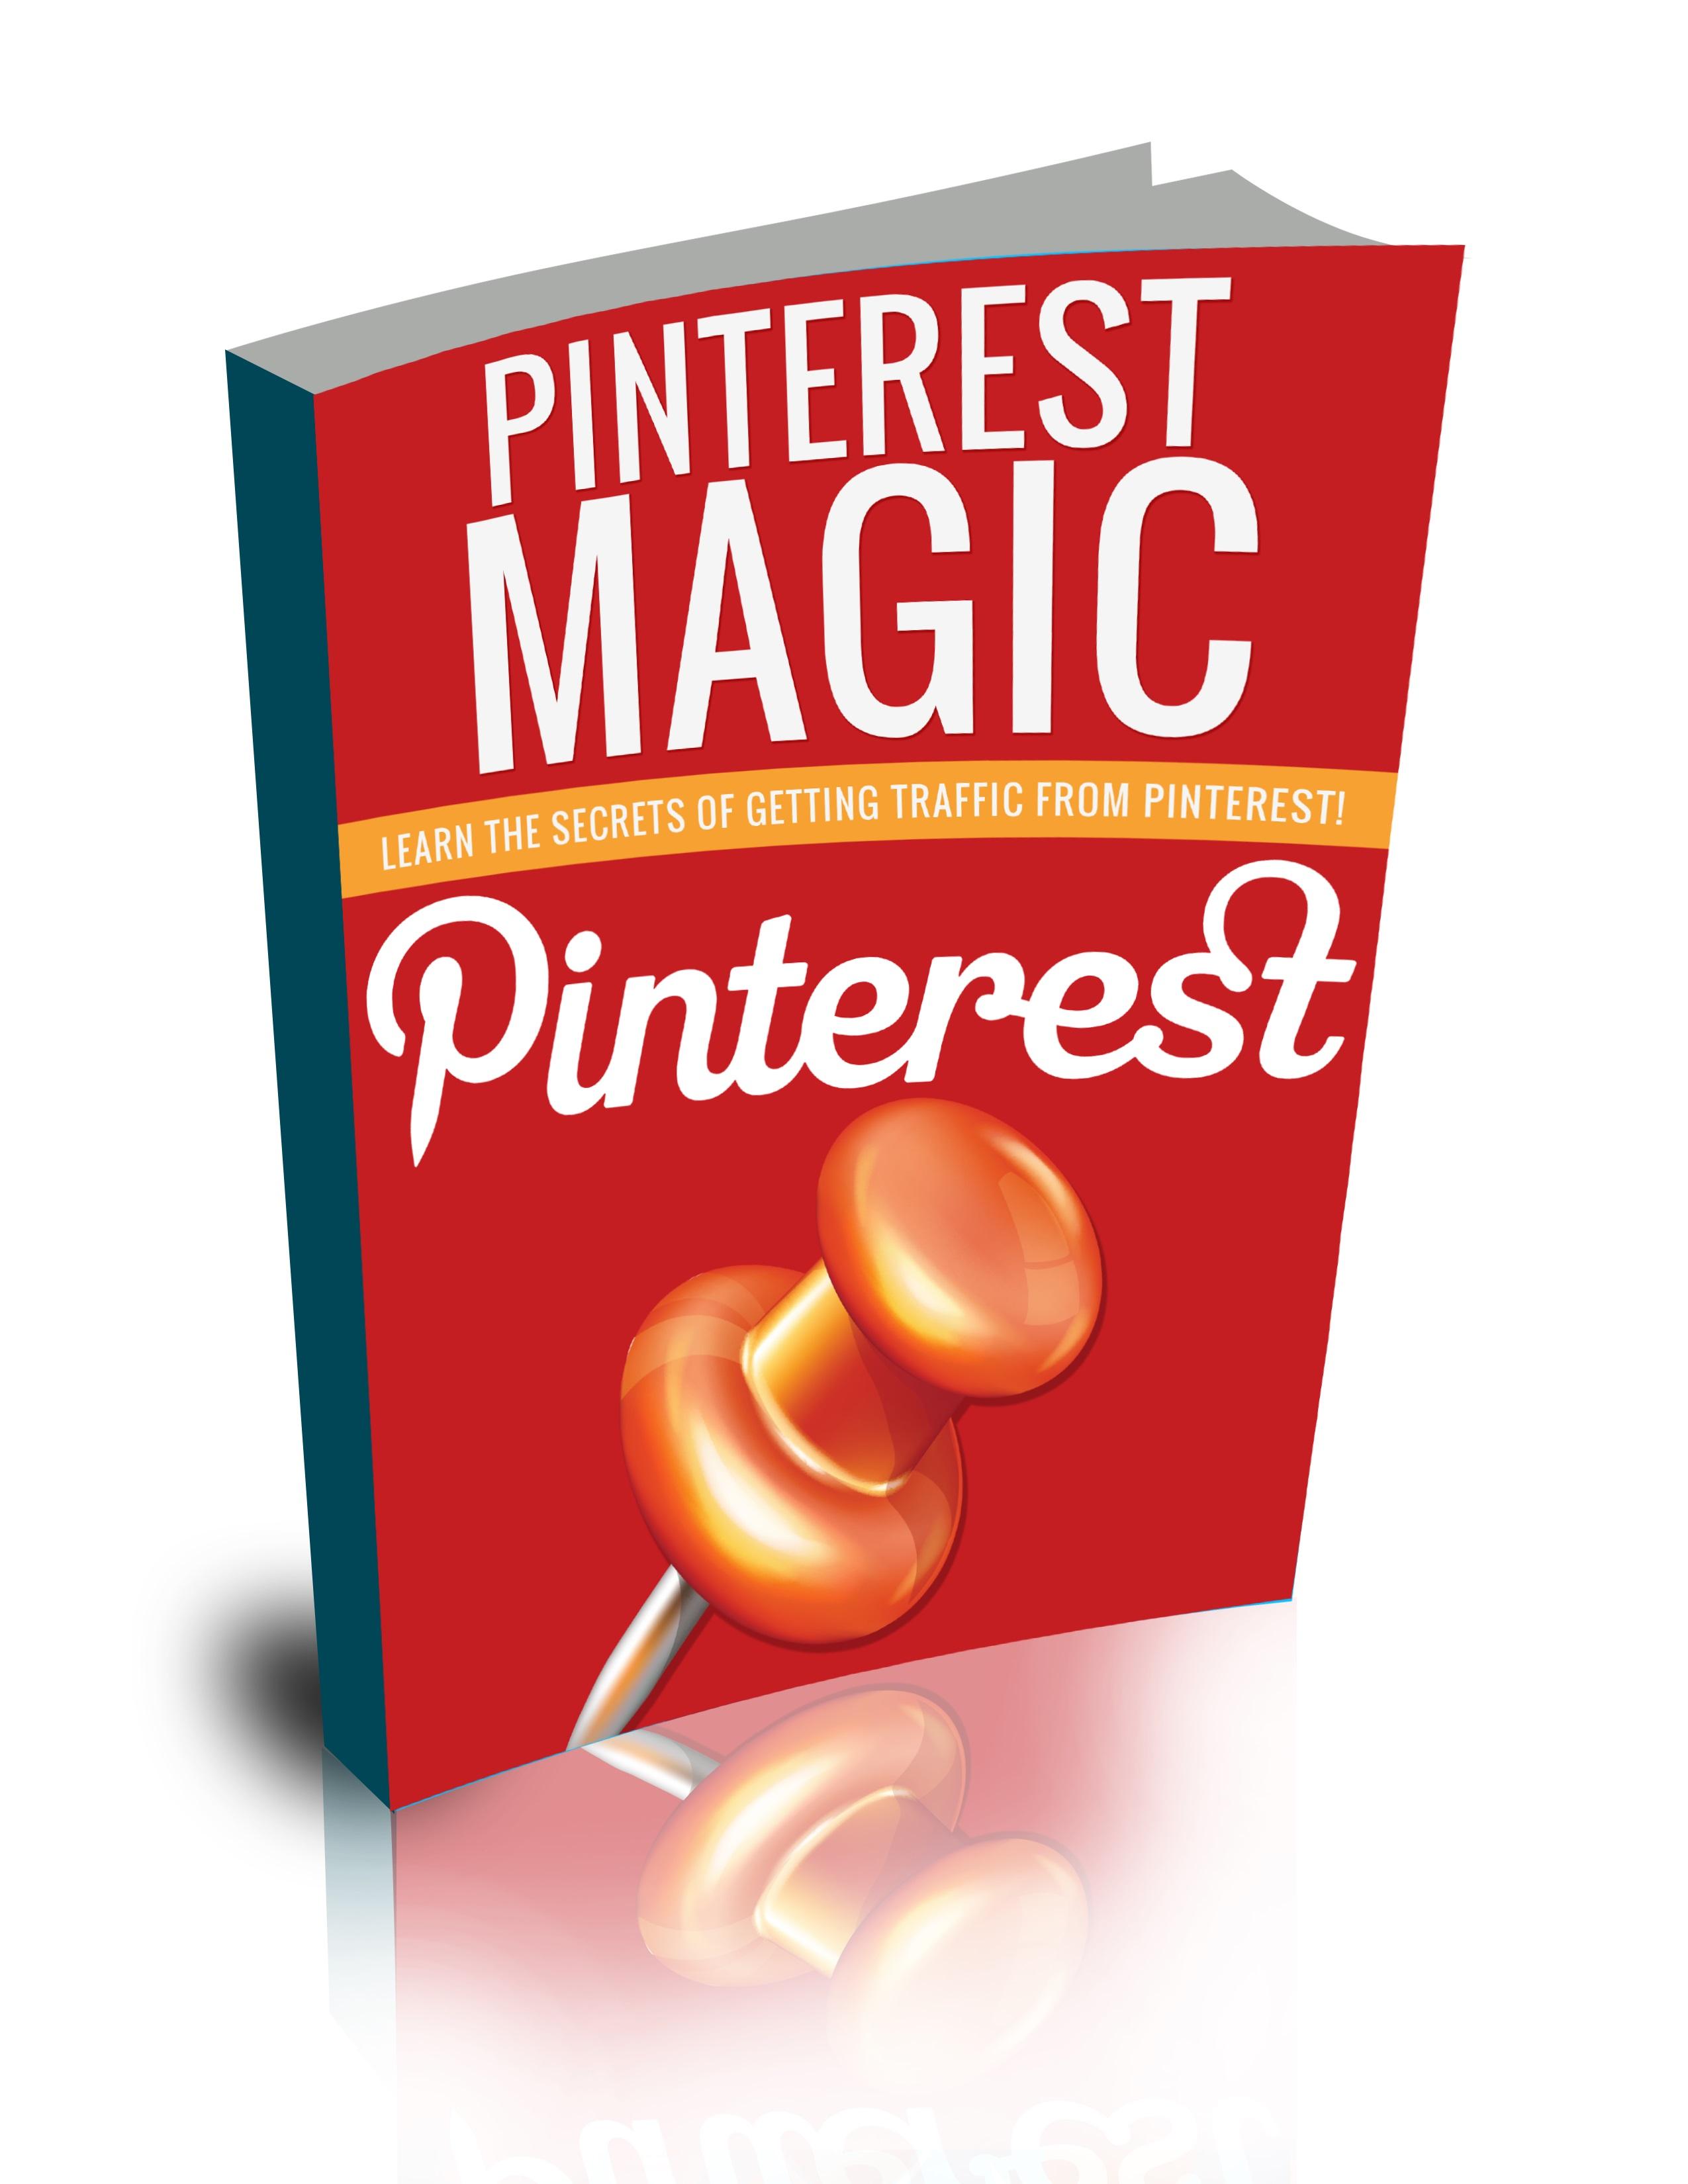 Pinterest Magic Package